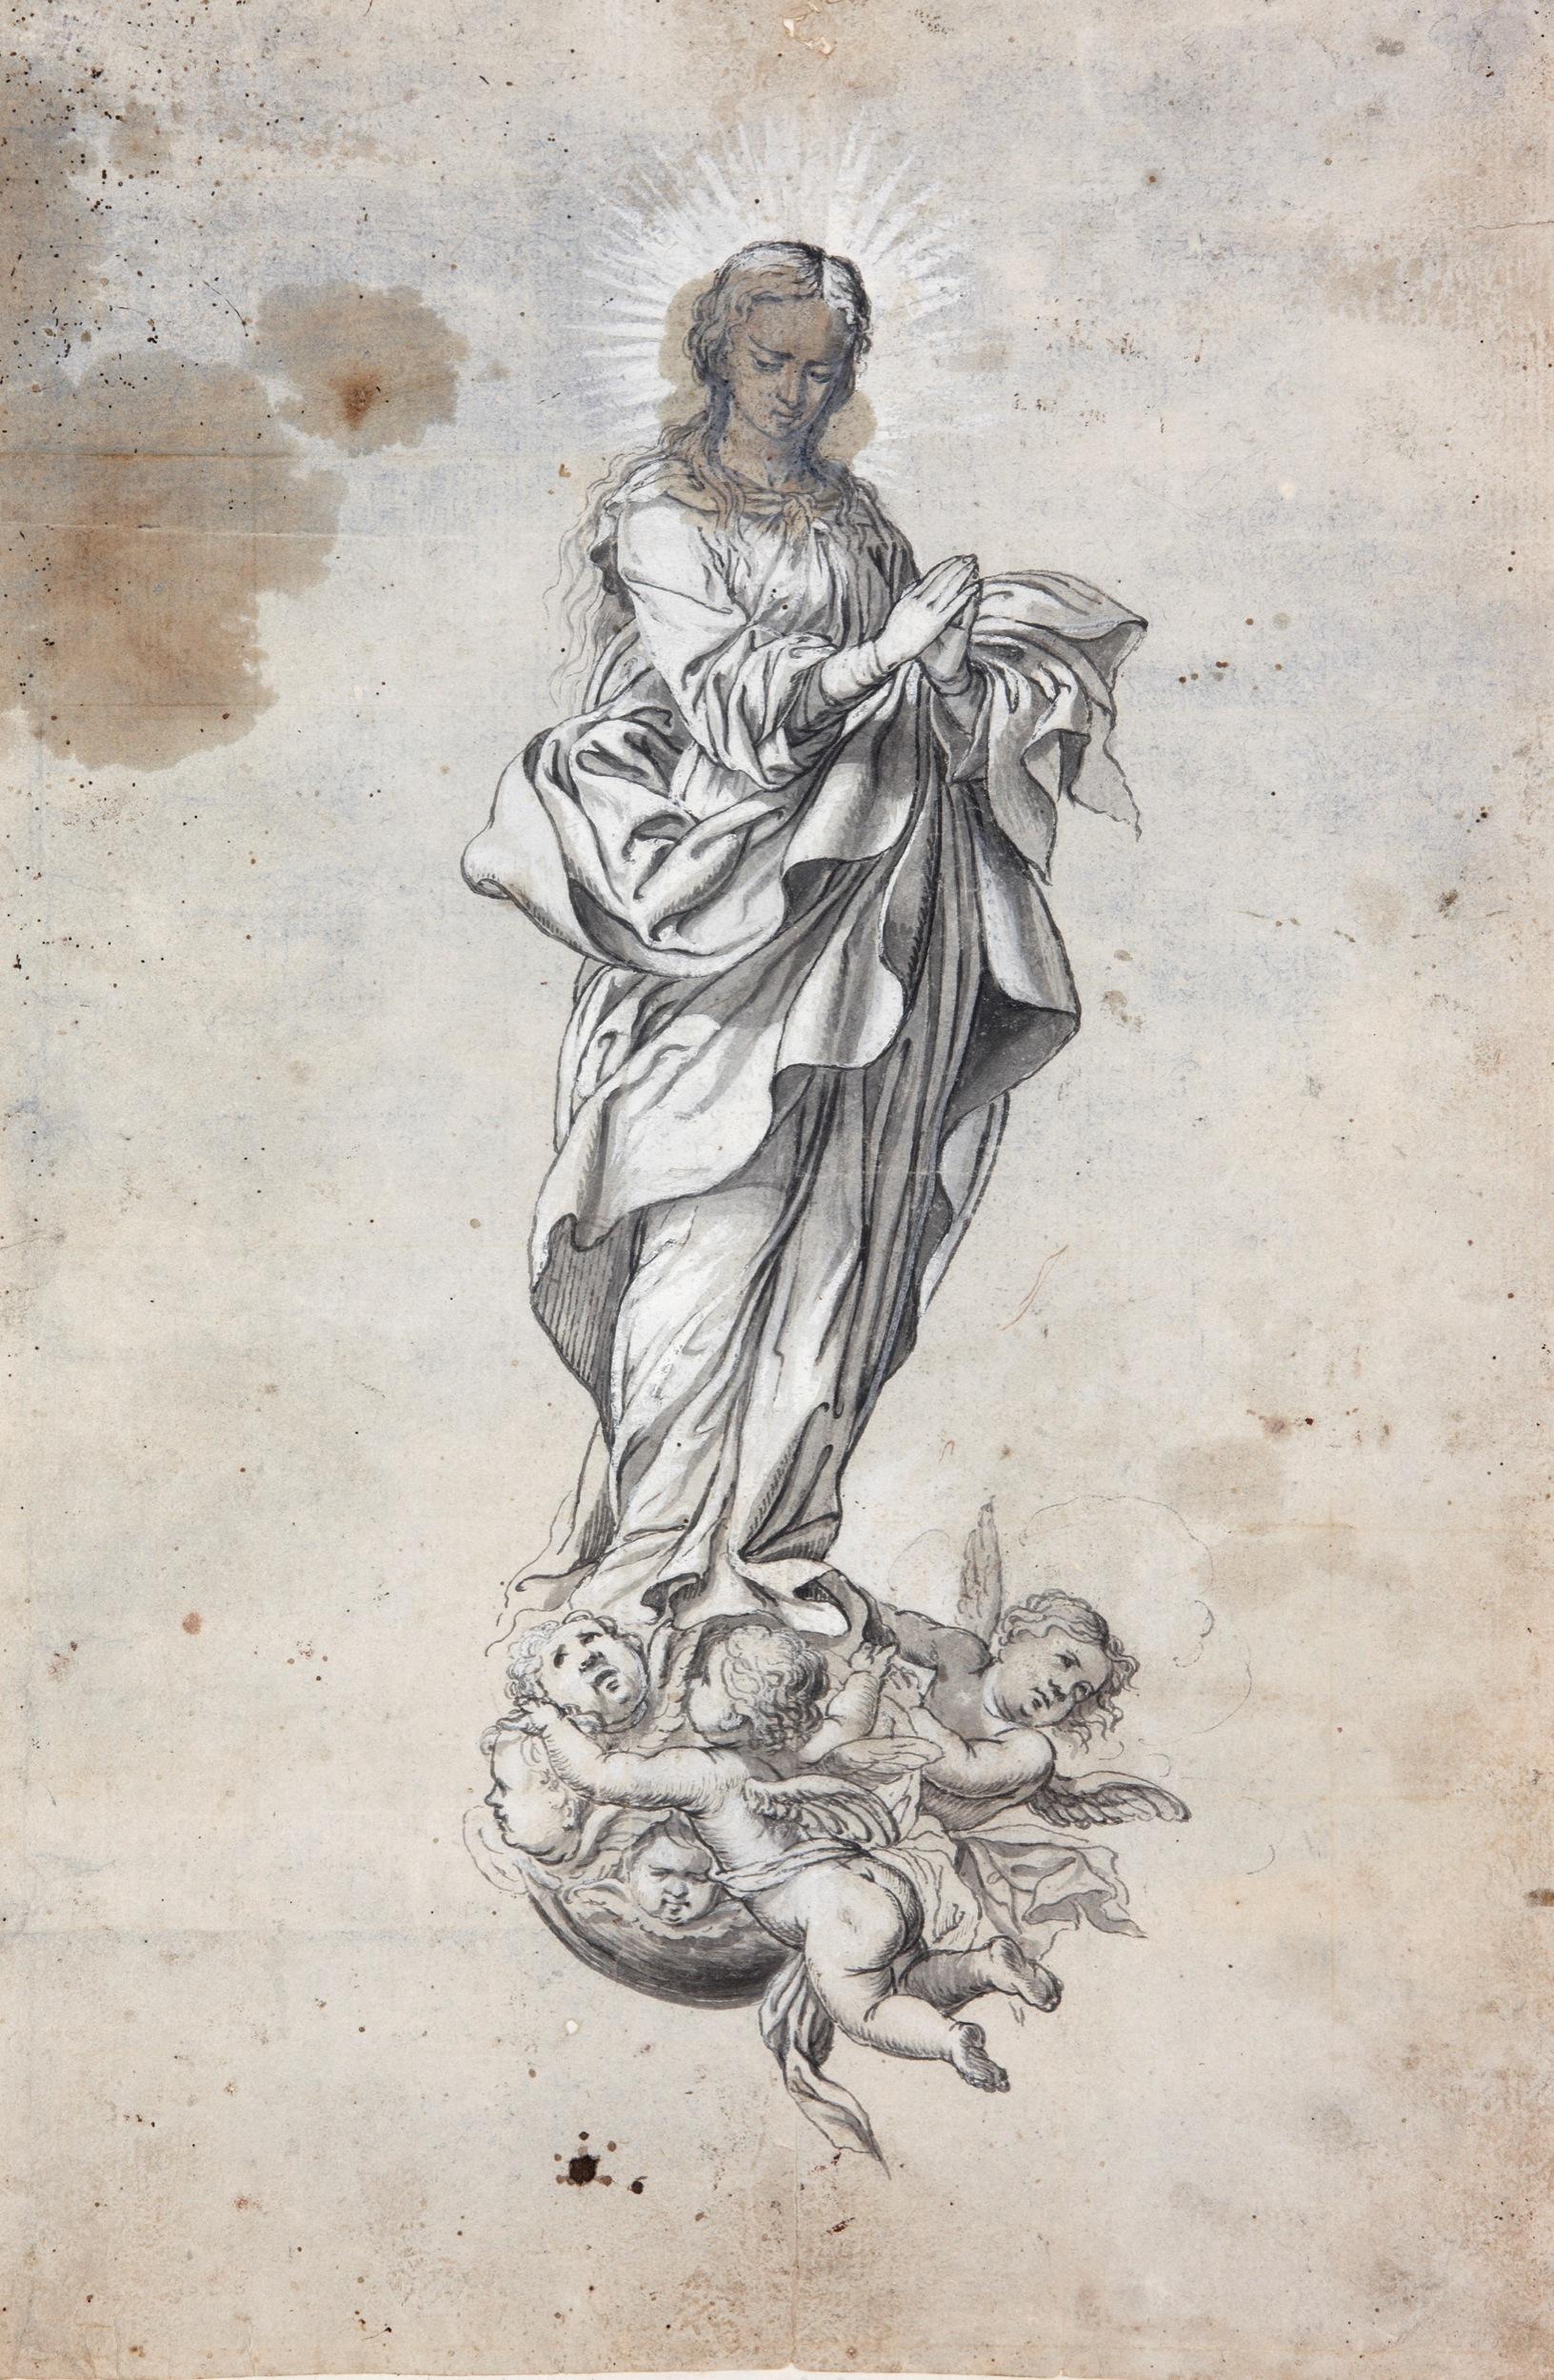 The Immaculate Conception - Granada School, 17th century